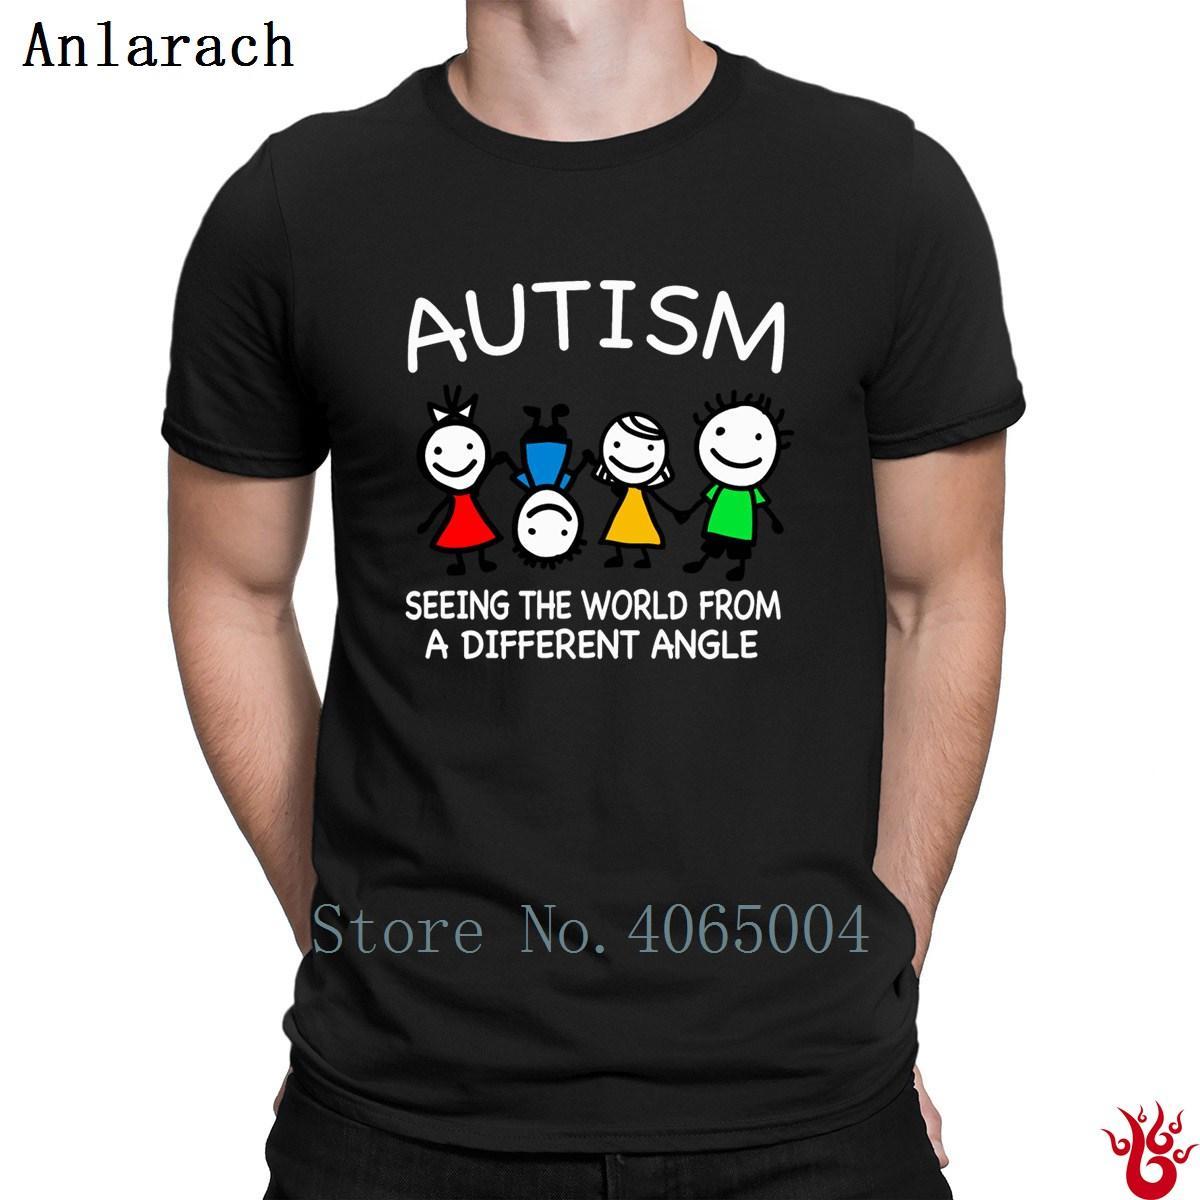 Autism Seeing The World T Shirt Hip Hop Standard New Fashion Tshirt